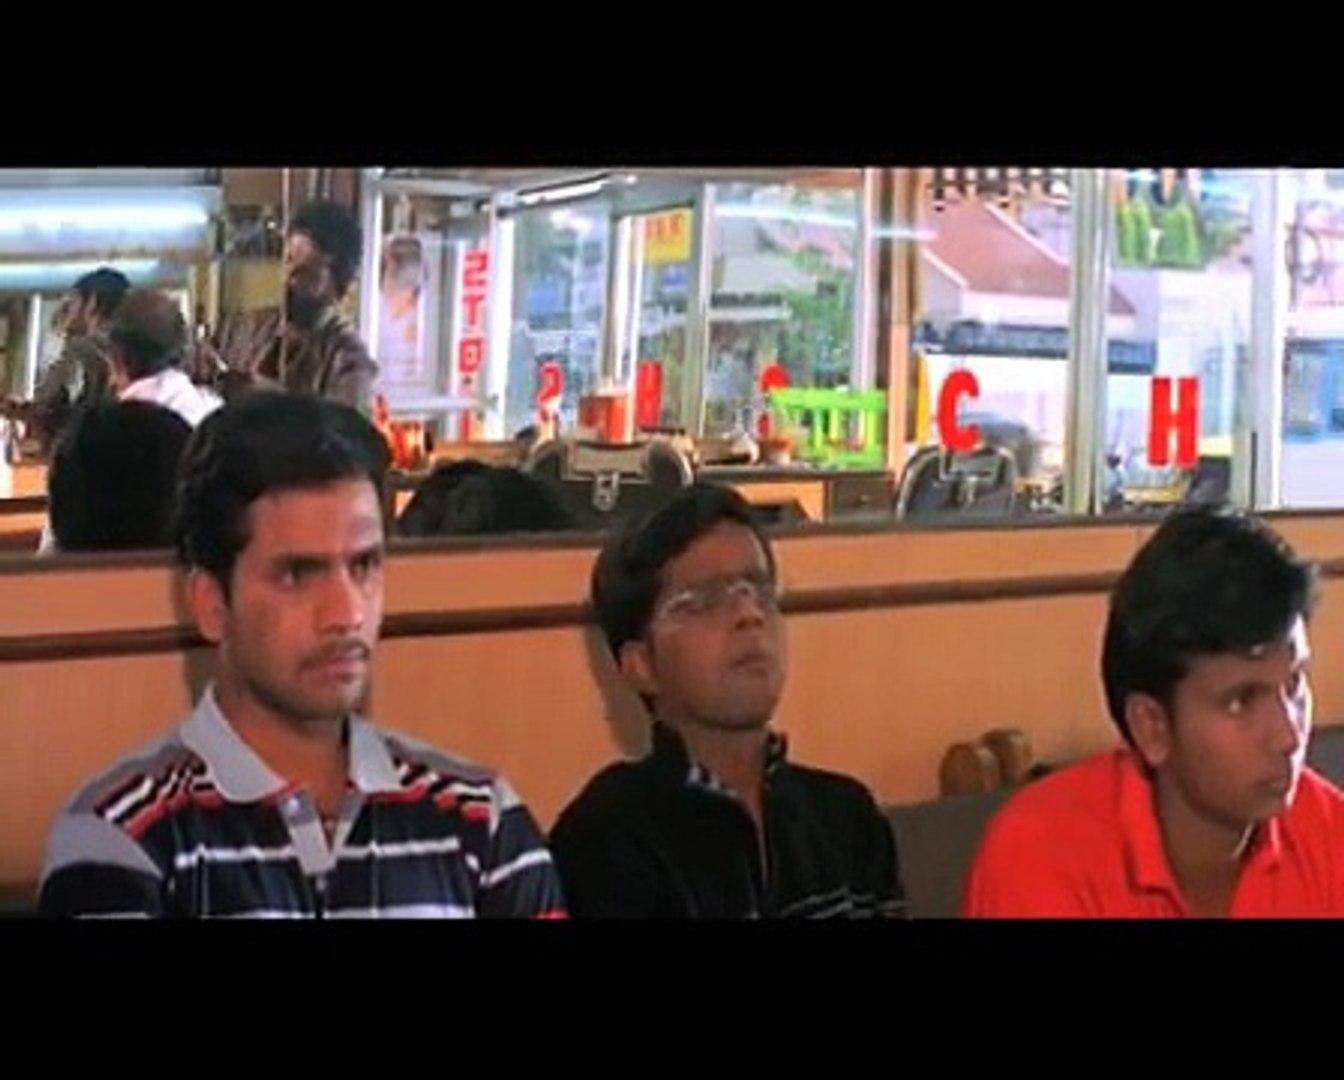 HAFTA VASOOL - Hindi Film - Full Movie - Murli - Ramya - Govind Namdev part 3/3